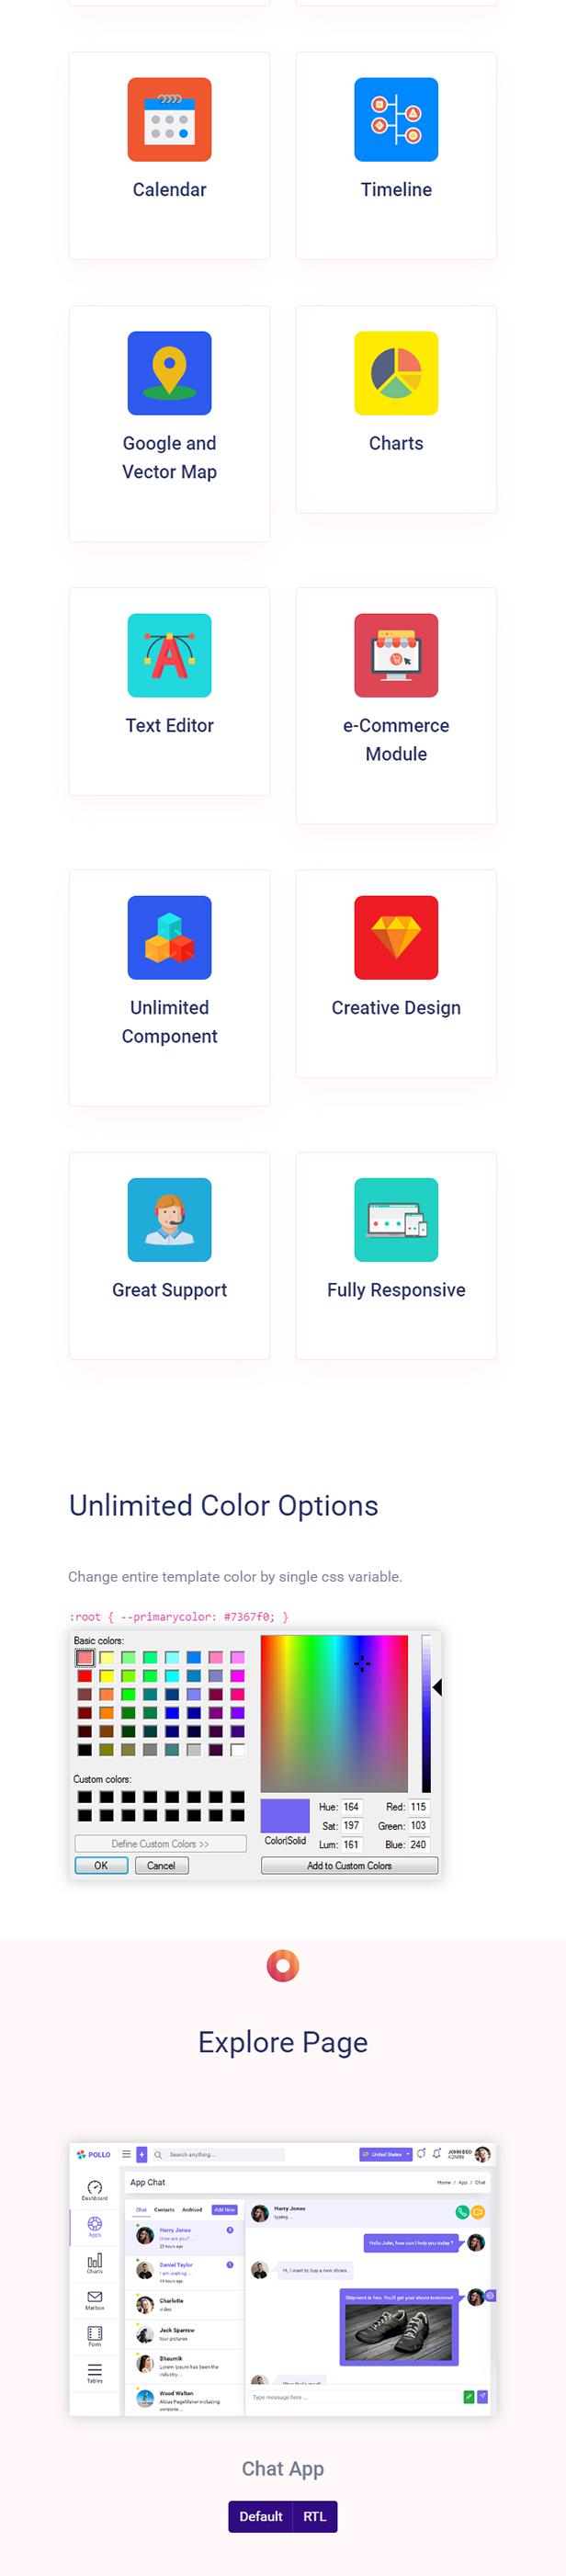 Pollo - Clean & Minimal Bootstrap Admin Dashboard Template - 4